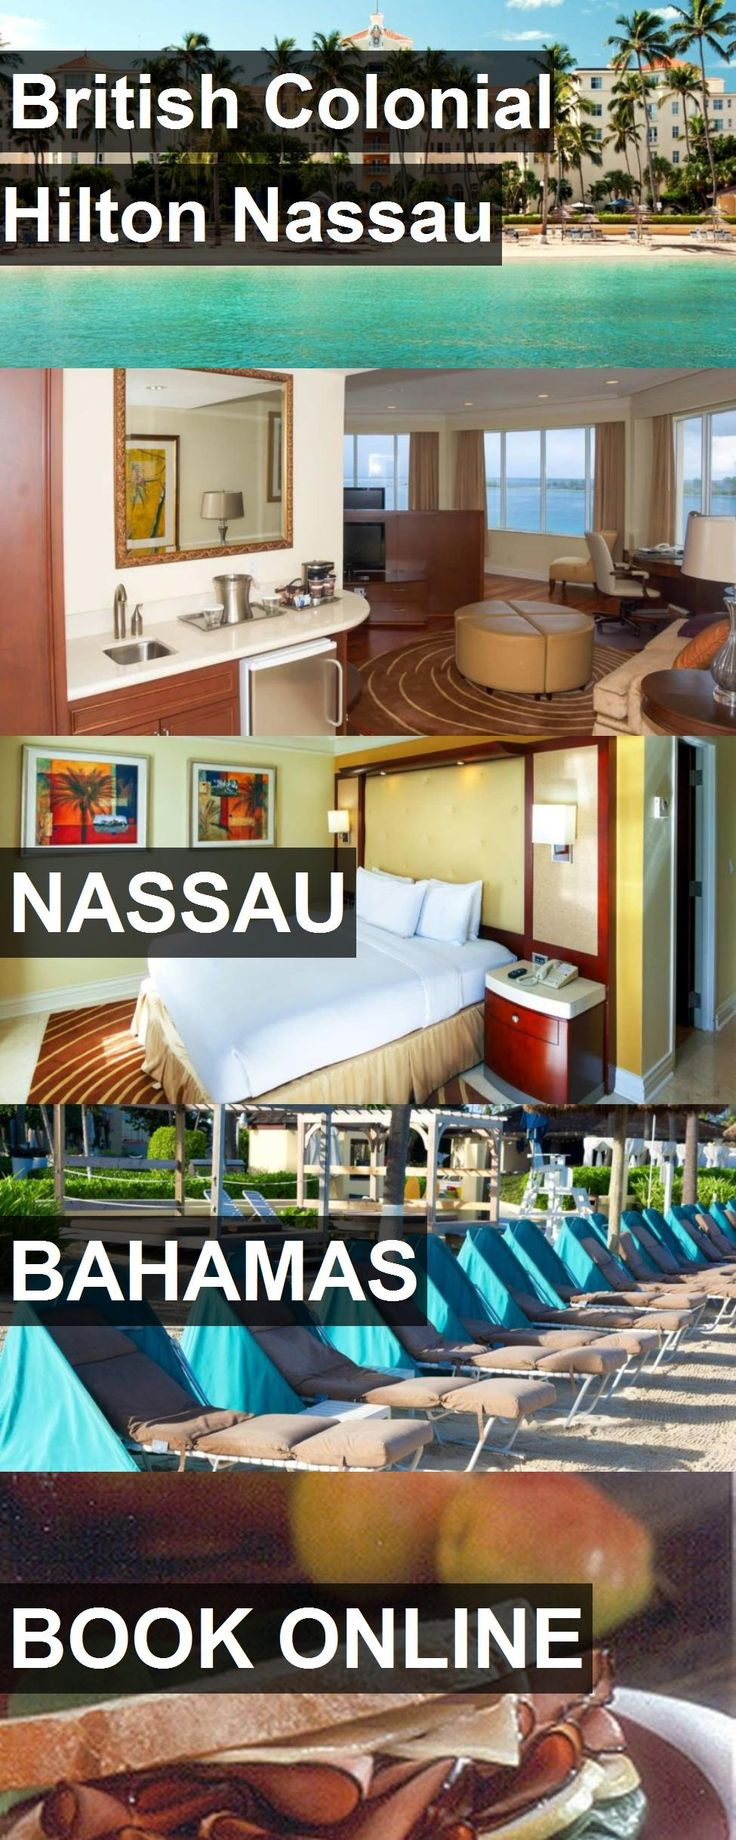 1740 house tripadvisor - Hotel British Colonial Hilton Nassau In Nassau Bahamas For More Information Photos